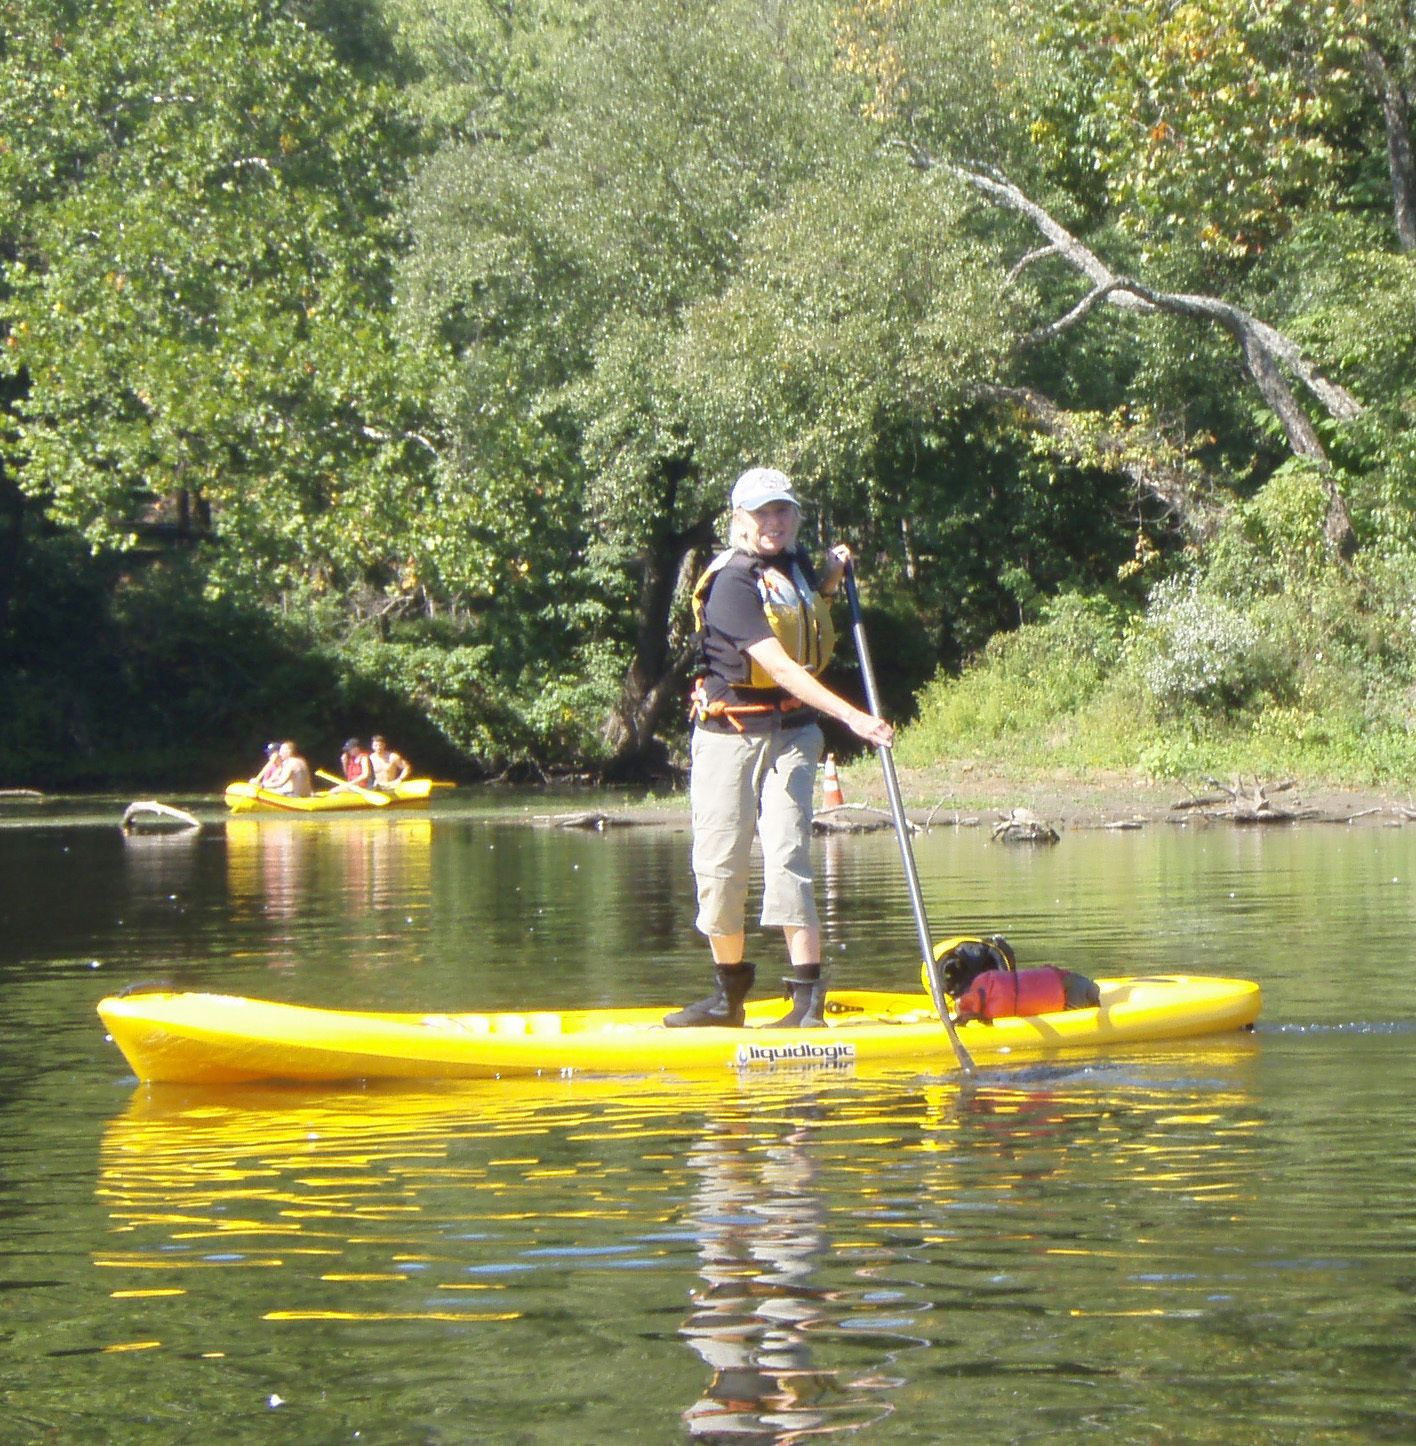 Photos - Philadelphia Canoe Club (Philadelphia, PA)